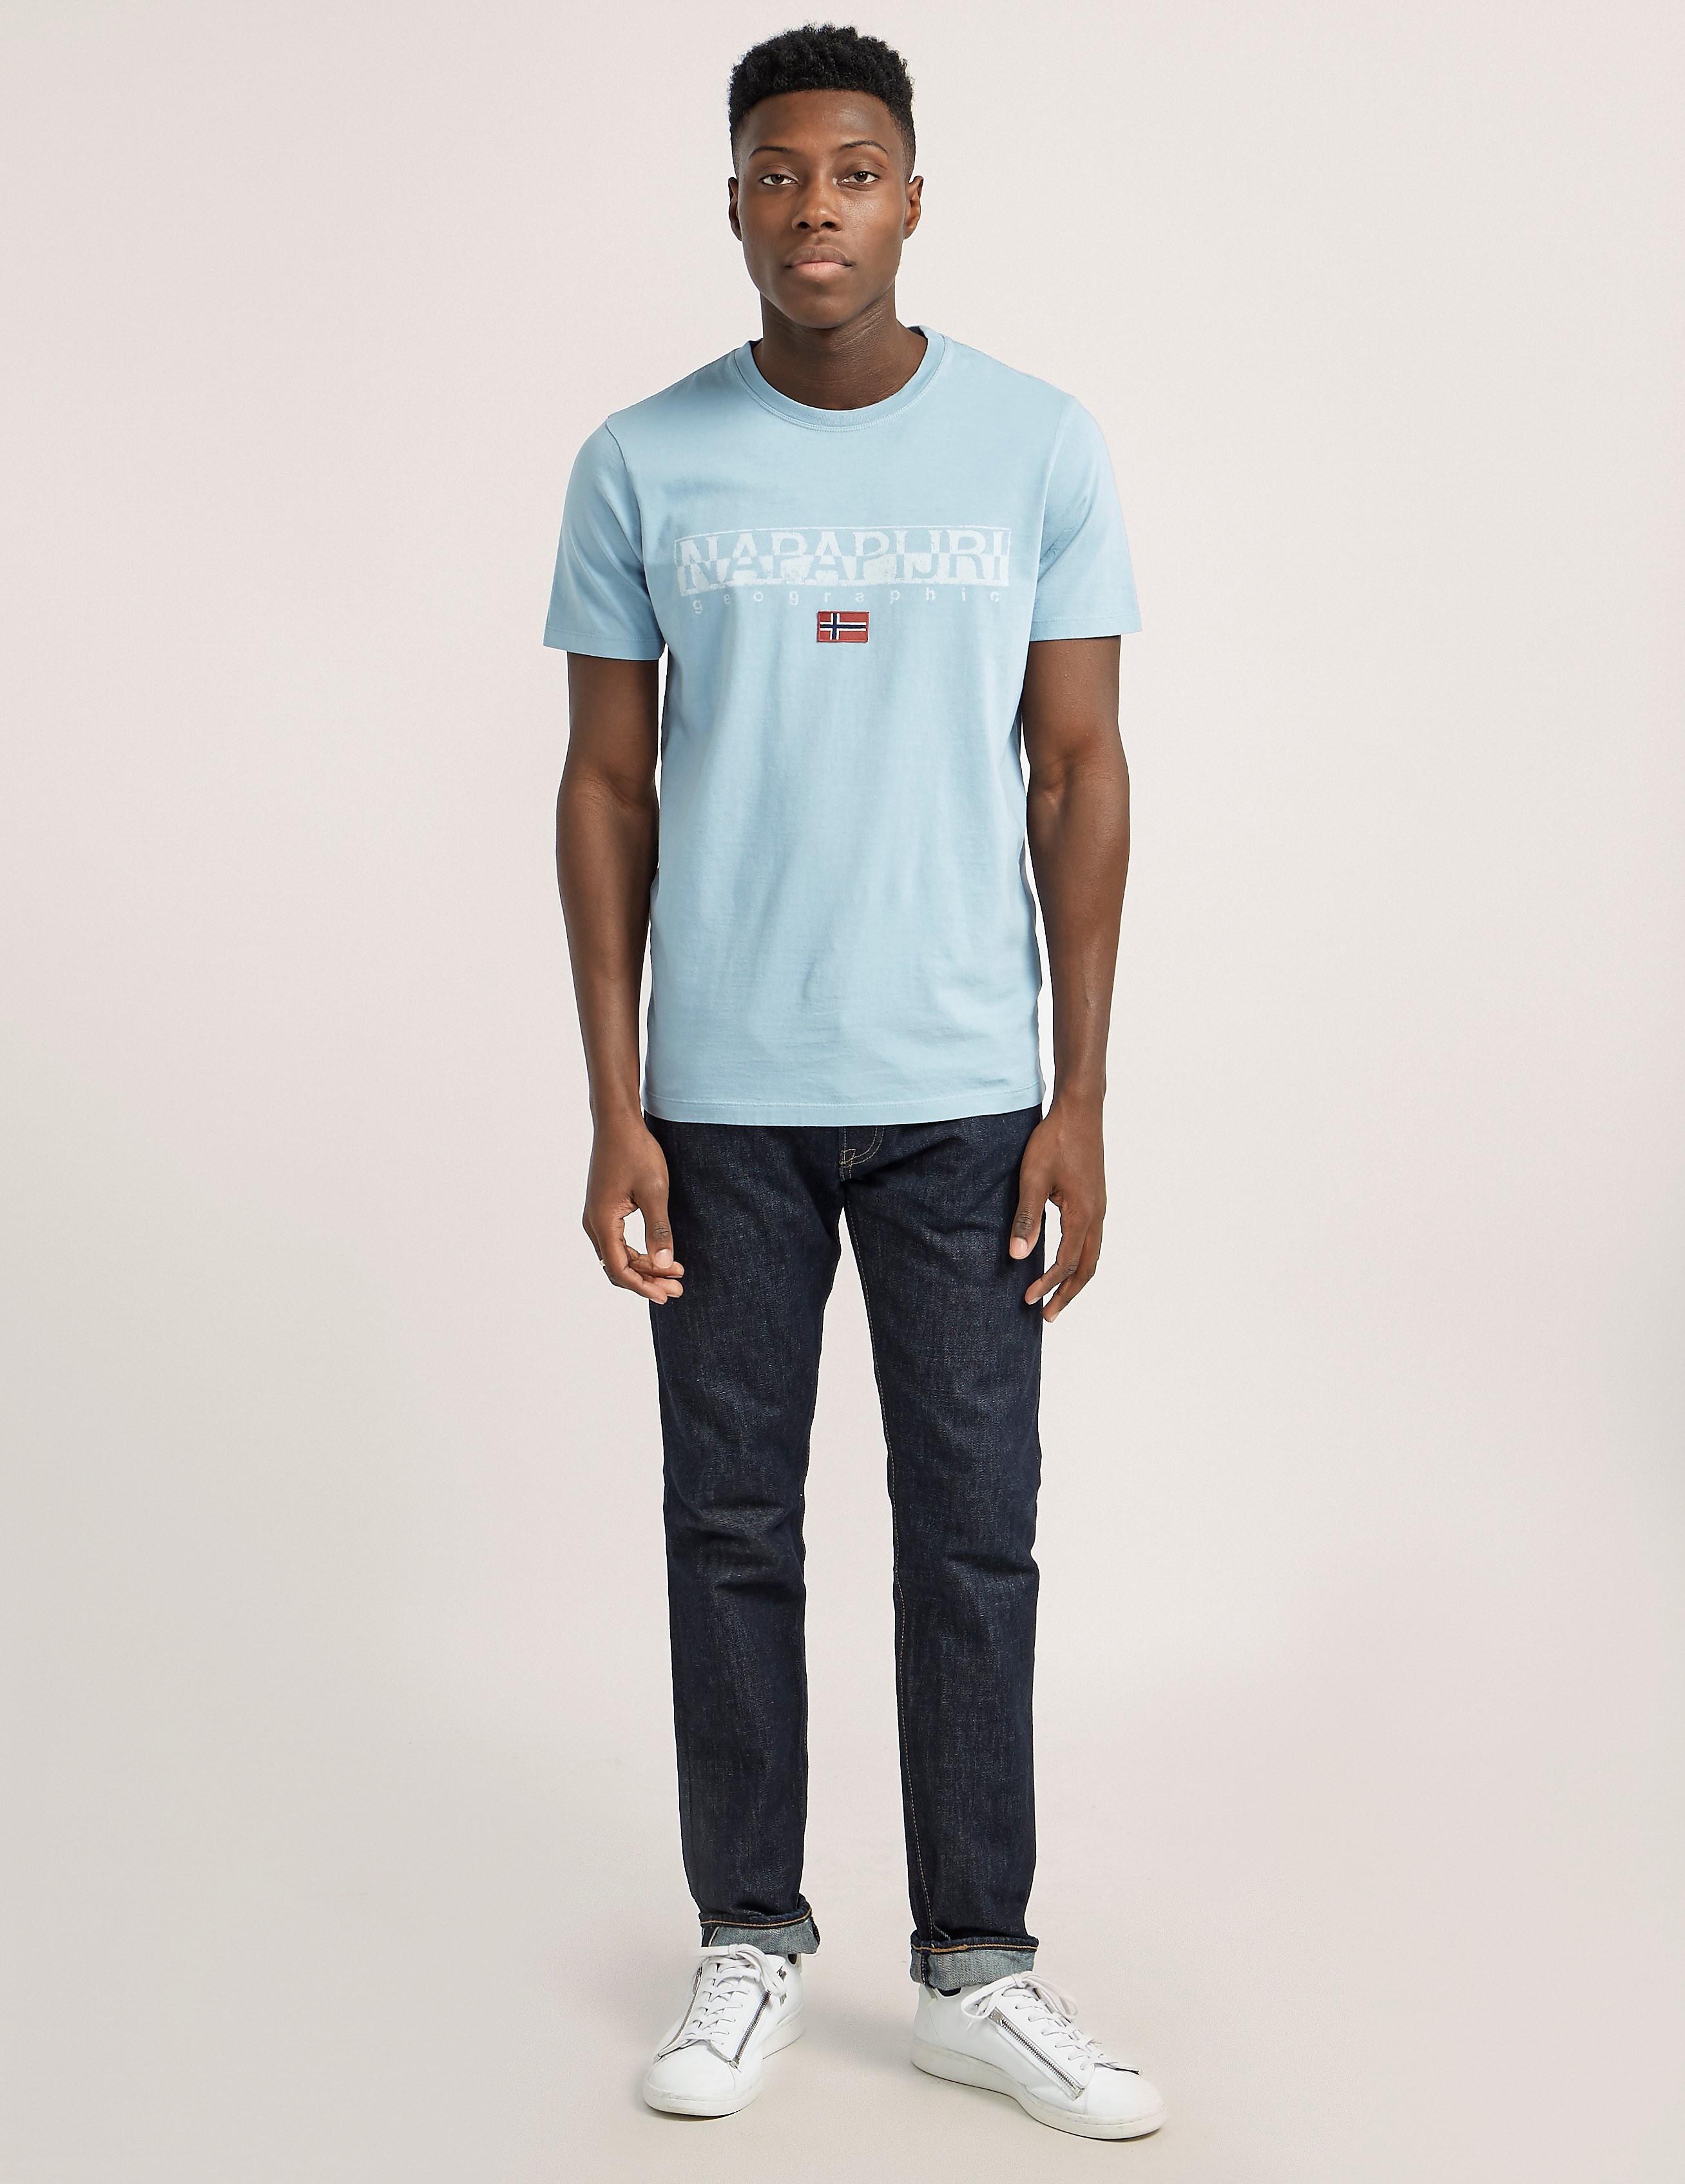 Napapijri Graphic T-Shirt